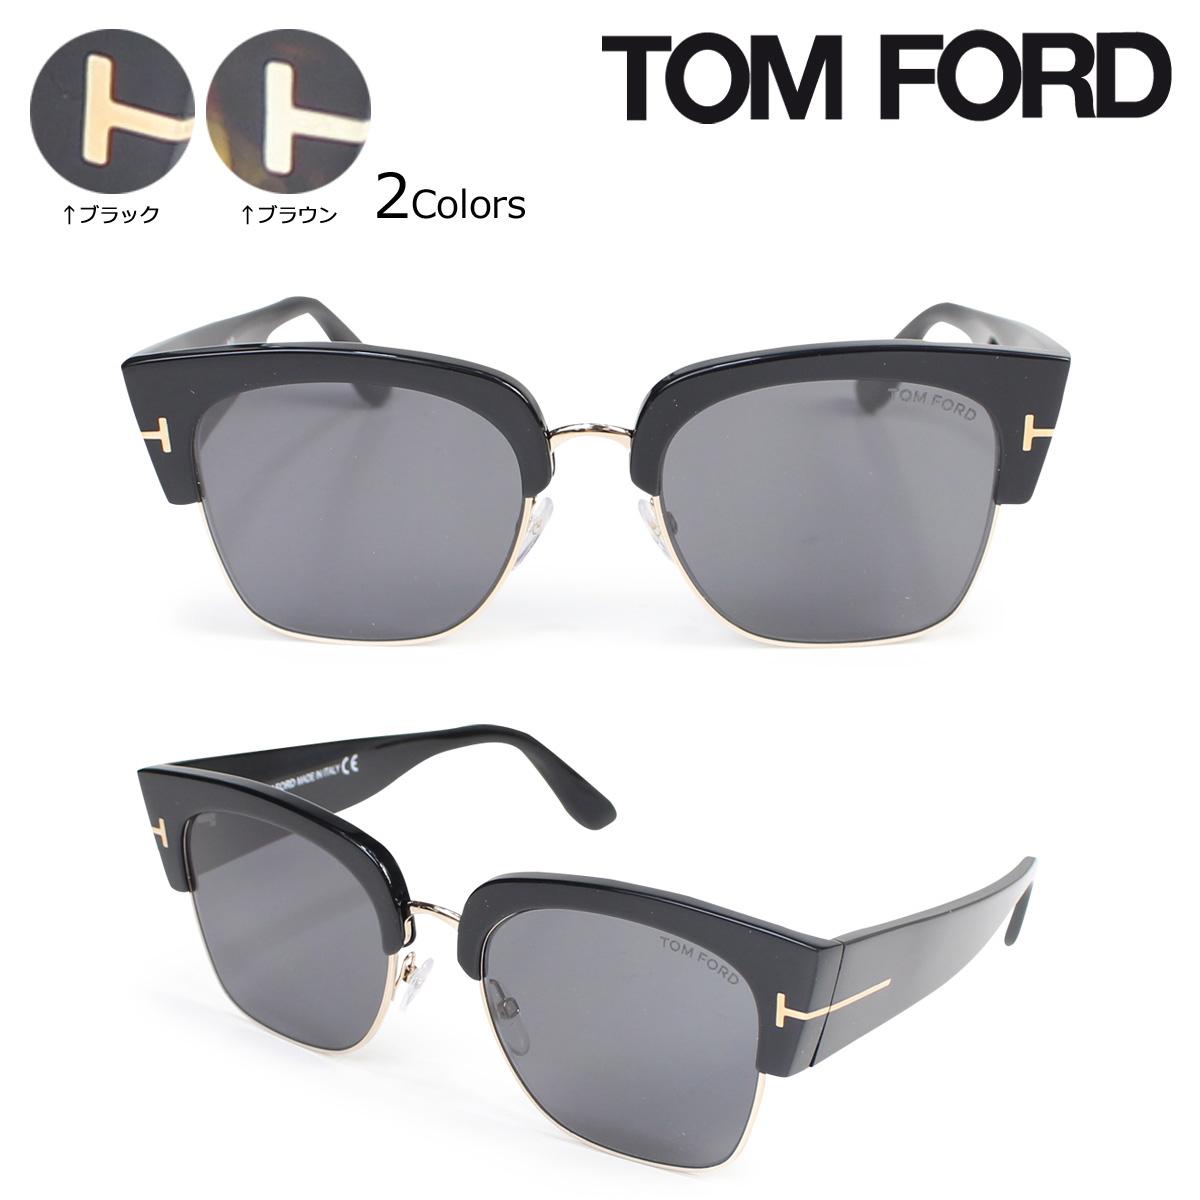 TOM FORD トムフォード サングラス メガネ メンズ レディース アイウェア FT0554 DAKOTA SUNGLASSES 2カラー [177]